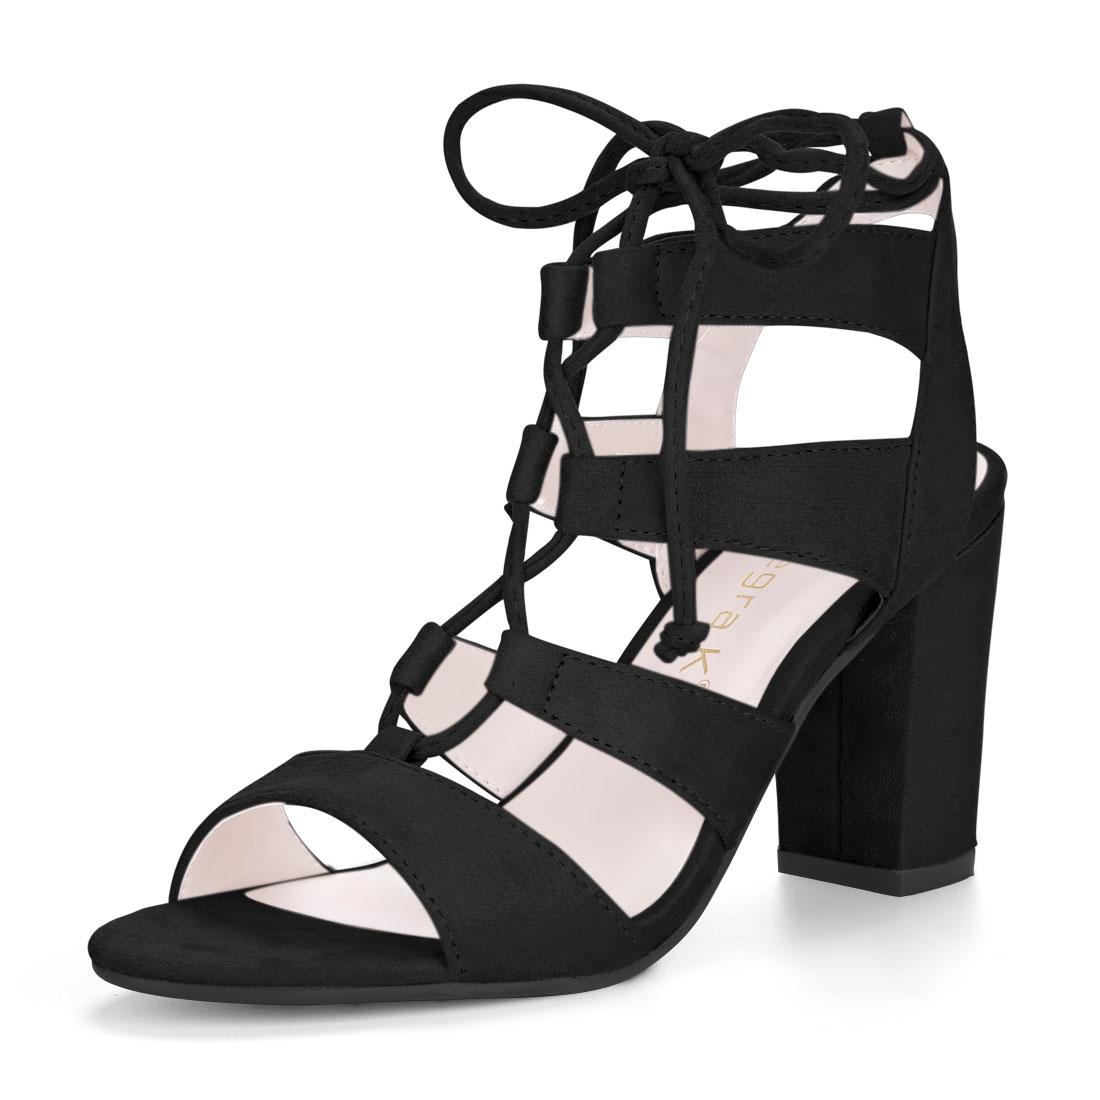 Allegra K Women's Tie Up Strappy Gladiator Block Heel Sandals Black US 8